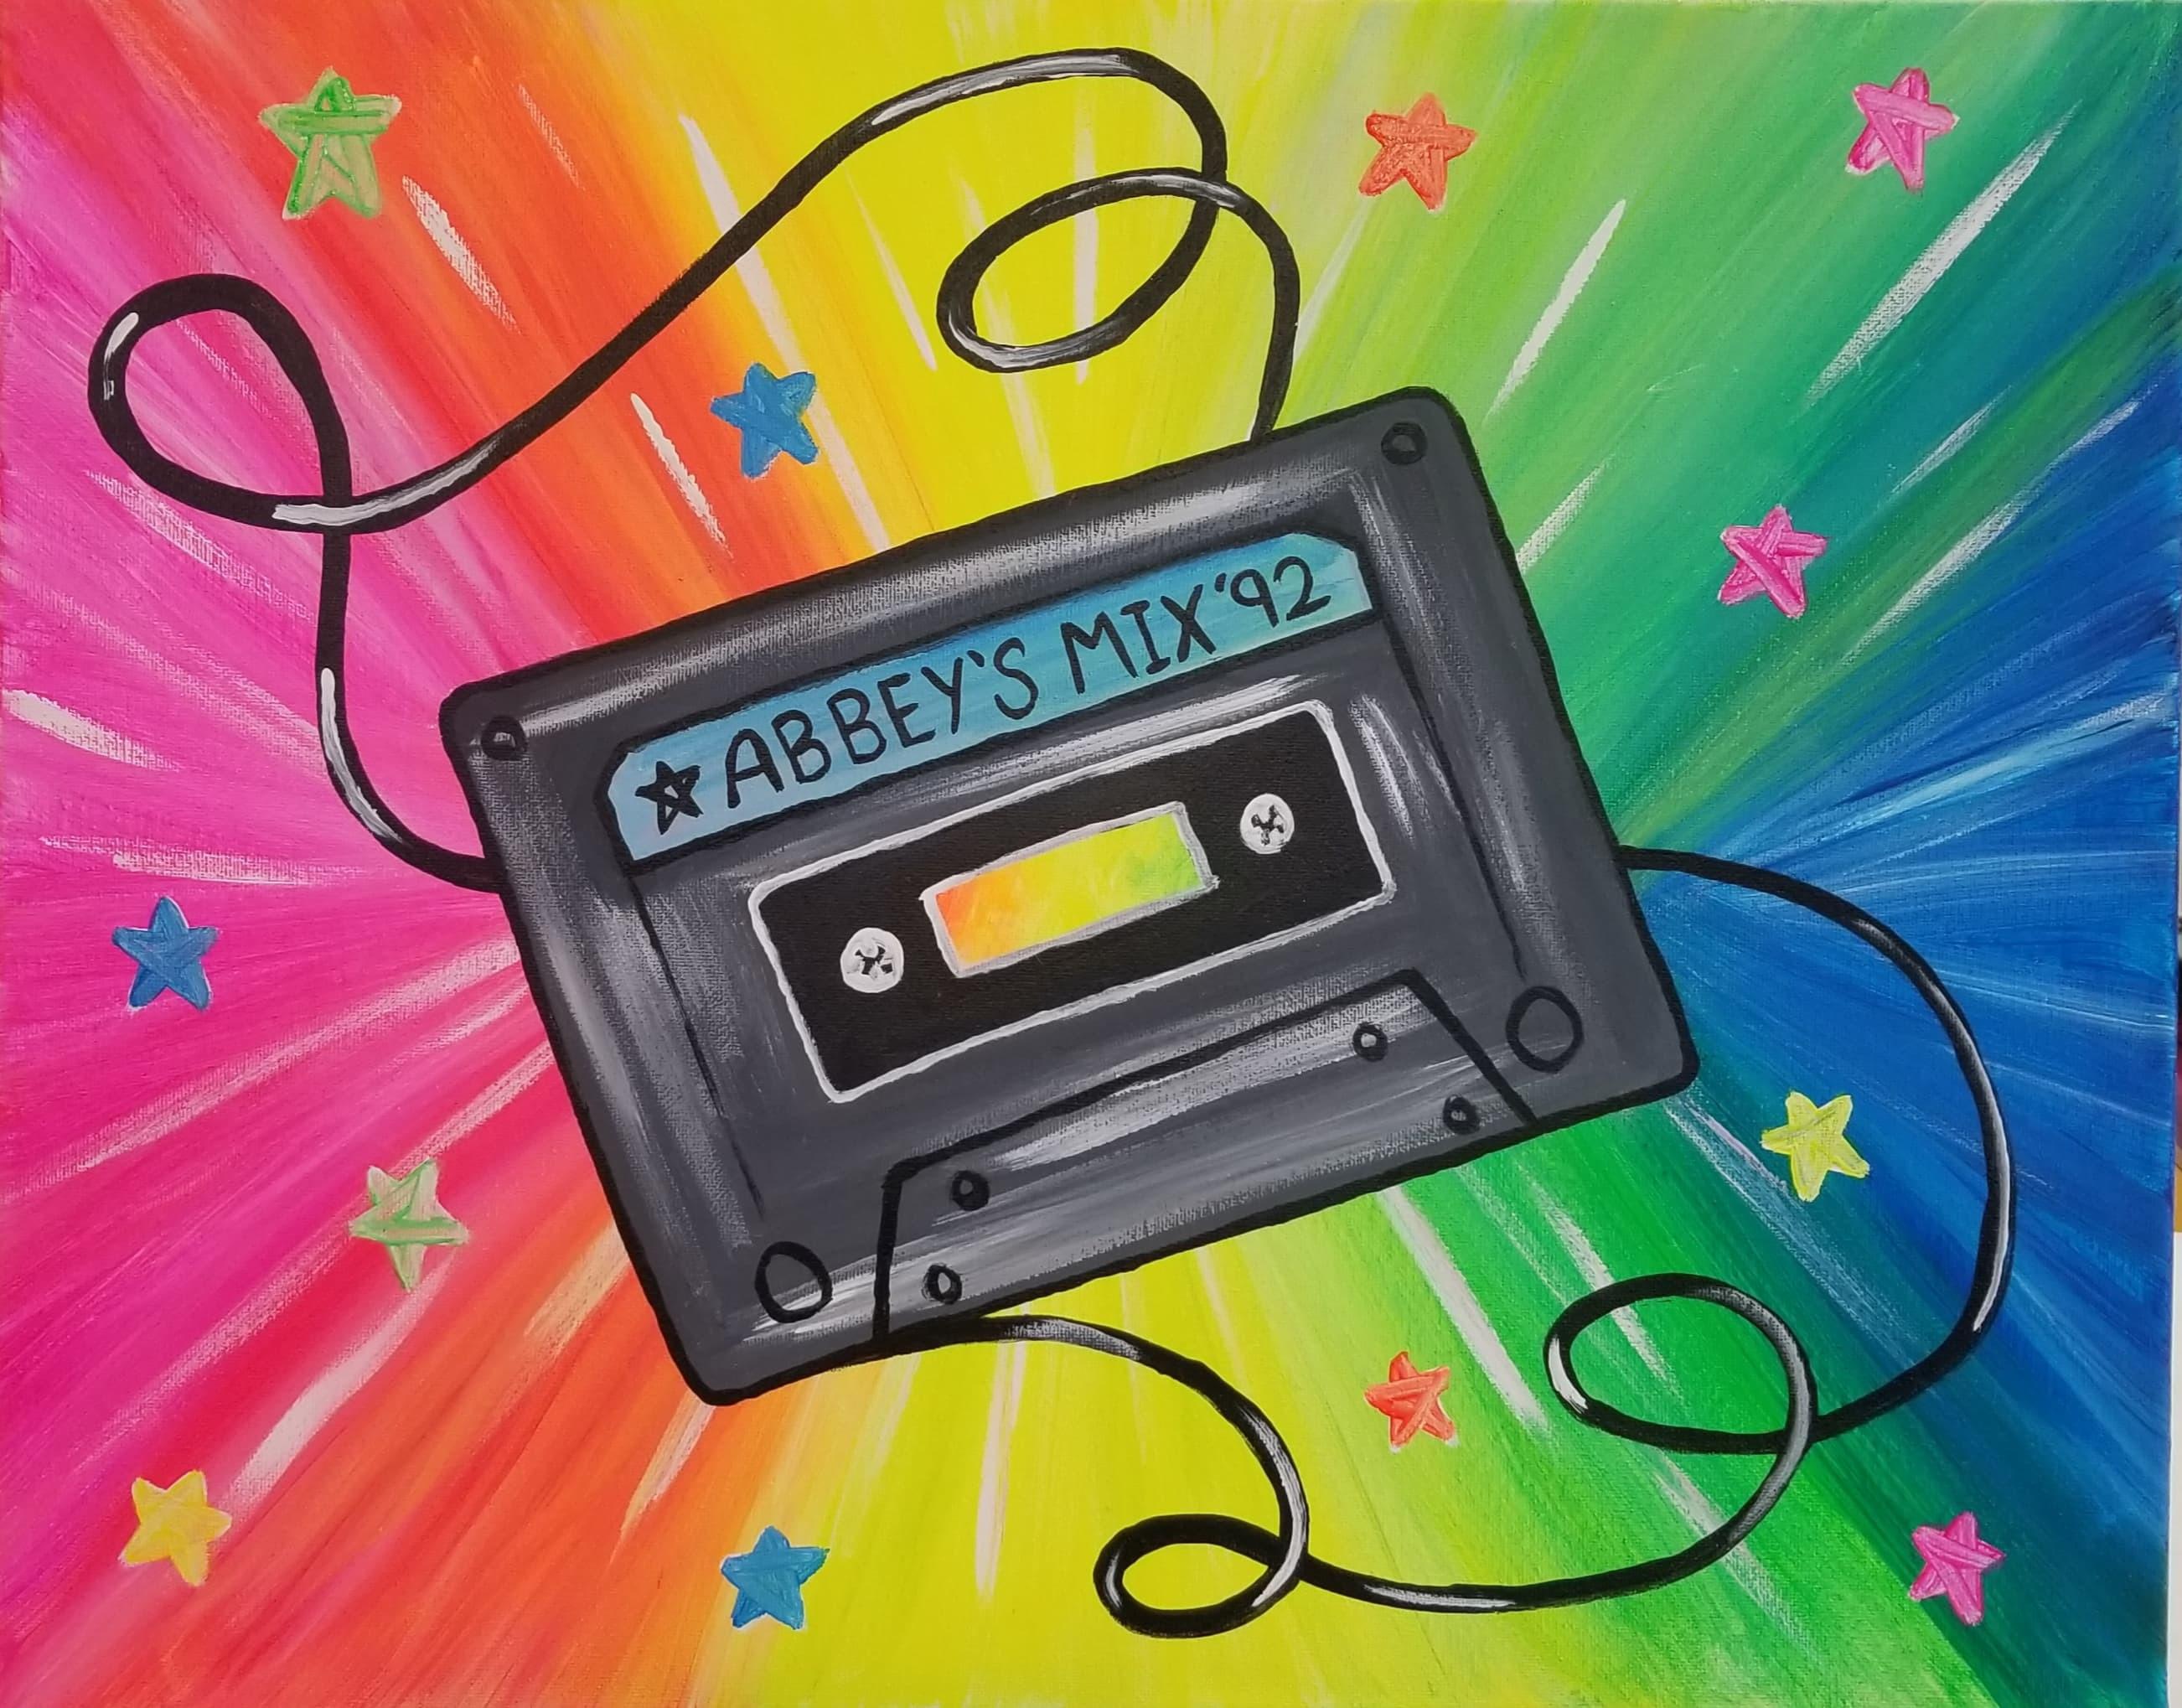 90s Trivia Paint Night